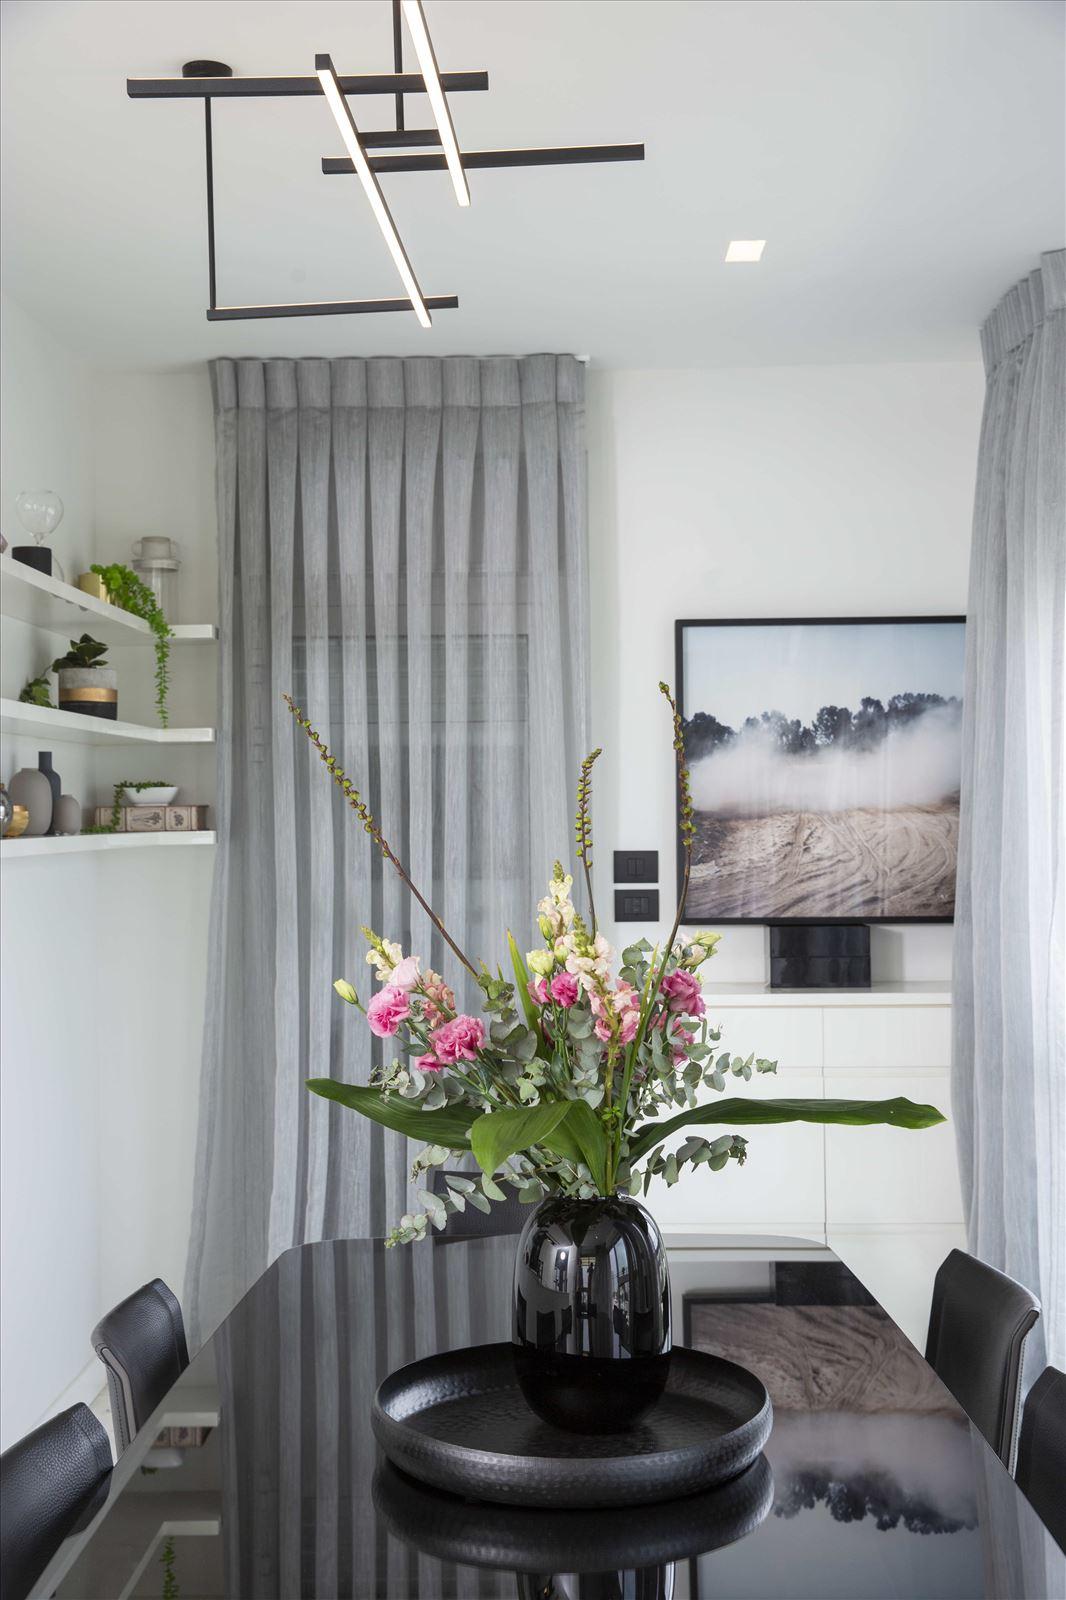 Tel Aviv apartment in Parisian aroma גופי תאורה מבית דורי קמחי